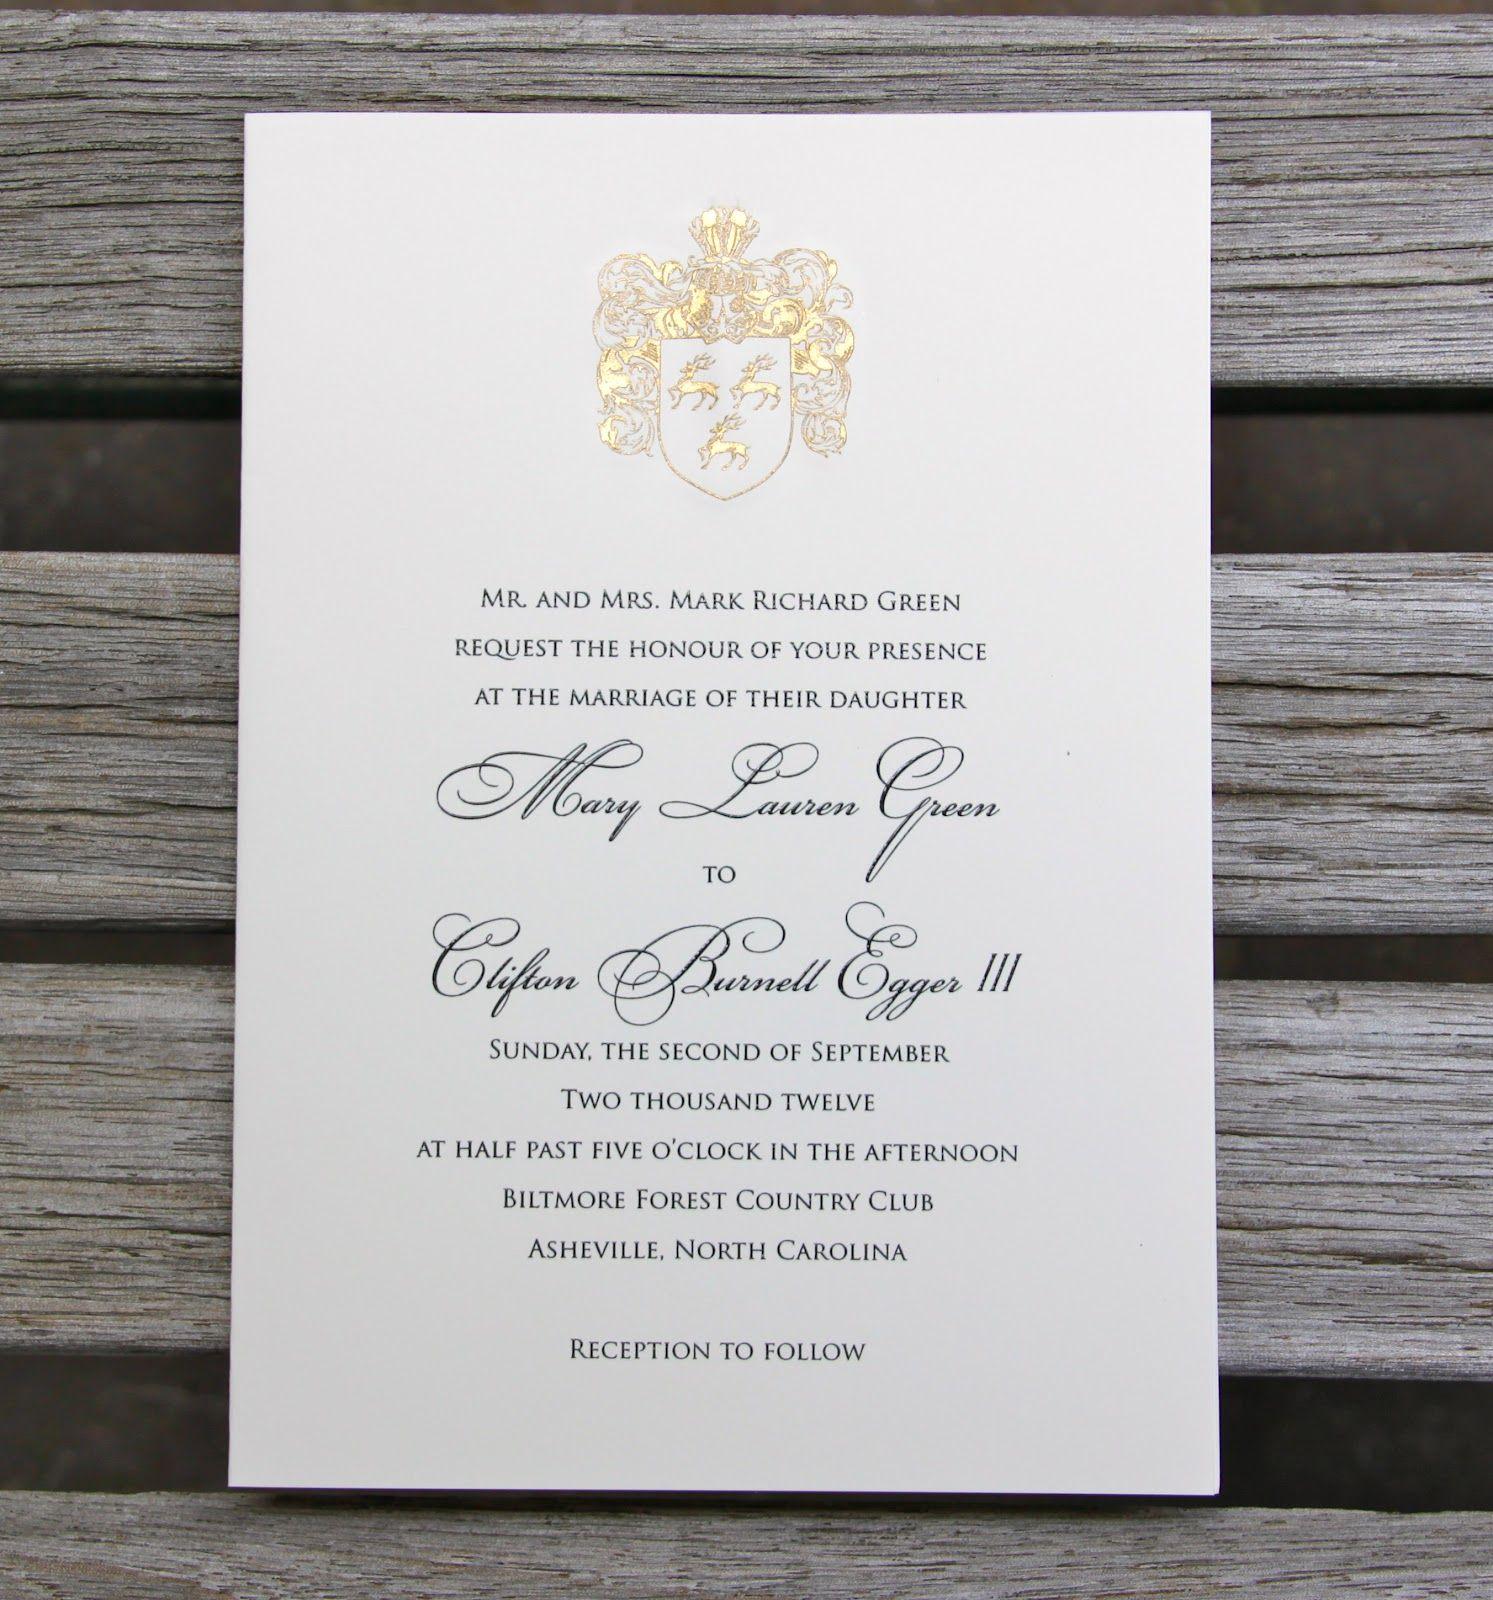 Family Crest Invitation Modern Calligraphy Wedding Invitation